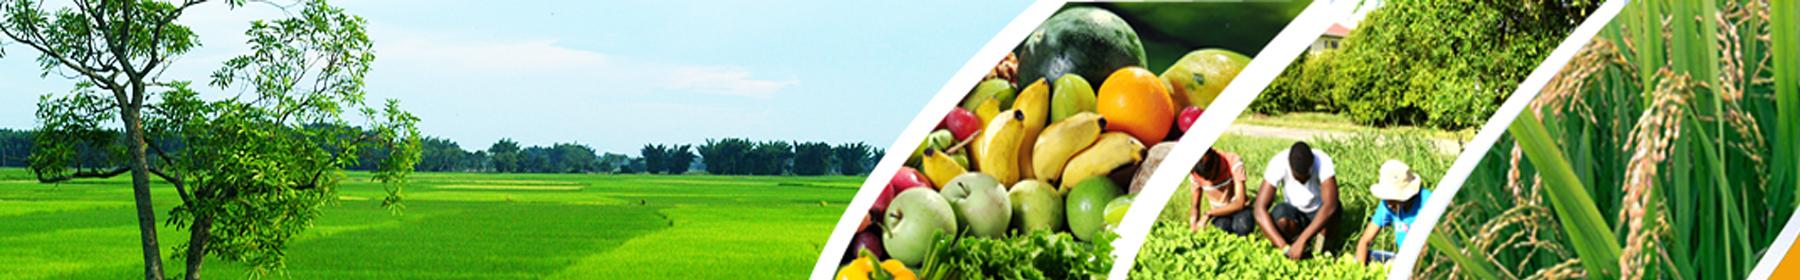 राष्ट्रीय कृषि विकास योजना (रफ़्तार